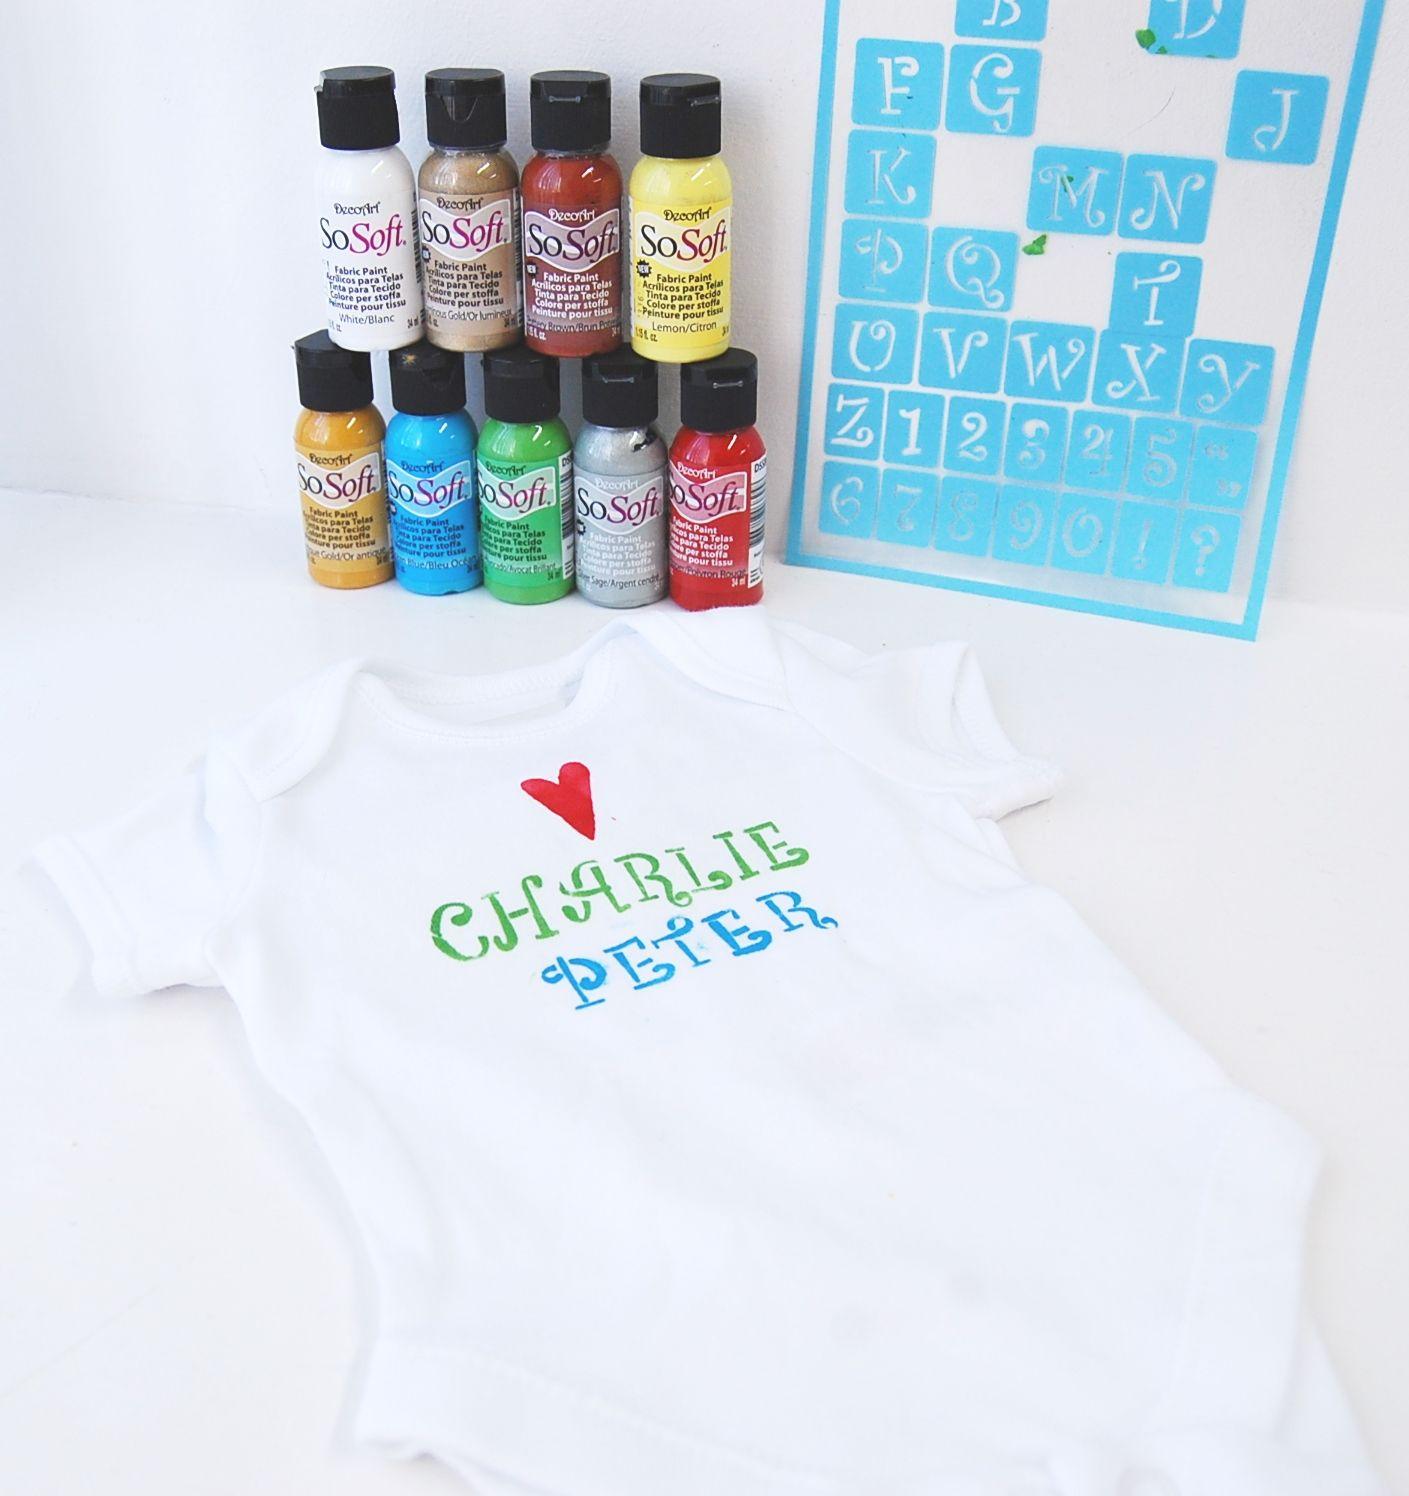 Easy Personalised Customised Baby Clothing Diy Stencilled Baby Grow Using Decoart Alphabet Stencils Decoart Sosoft Fa Alphabet Stencils Stencil Diy Stencils